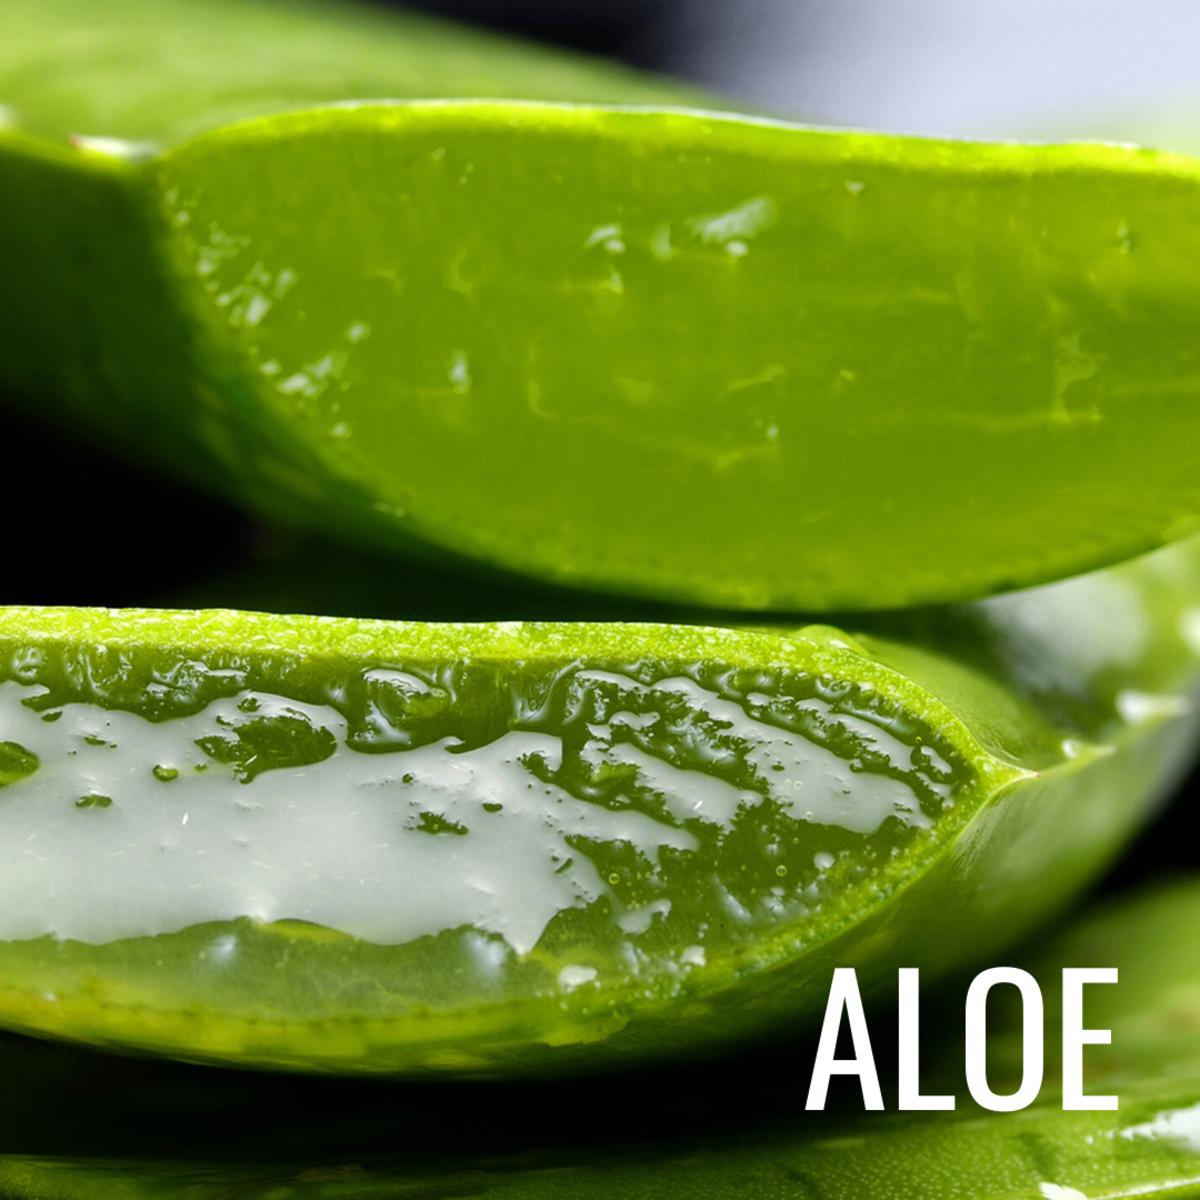 Aloe vera contains aloin, a compound that naturally depigments skin.